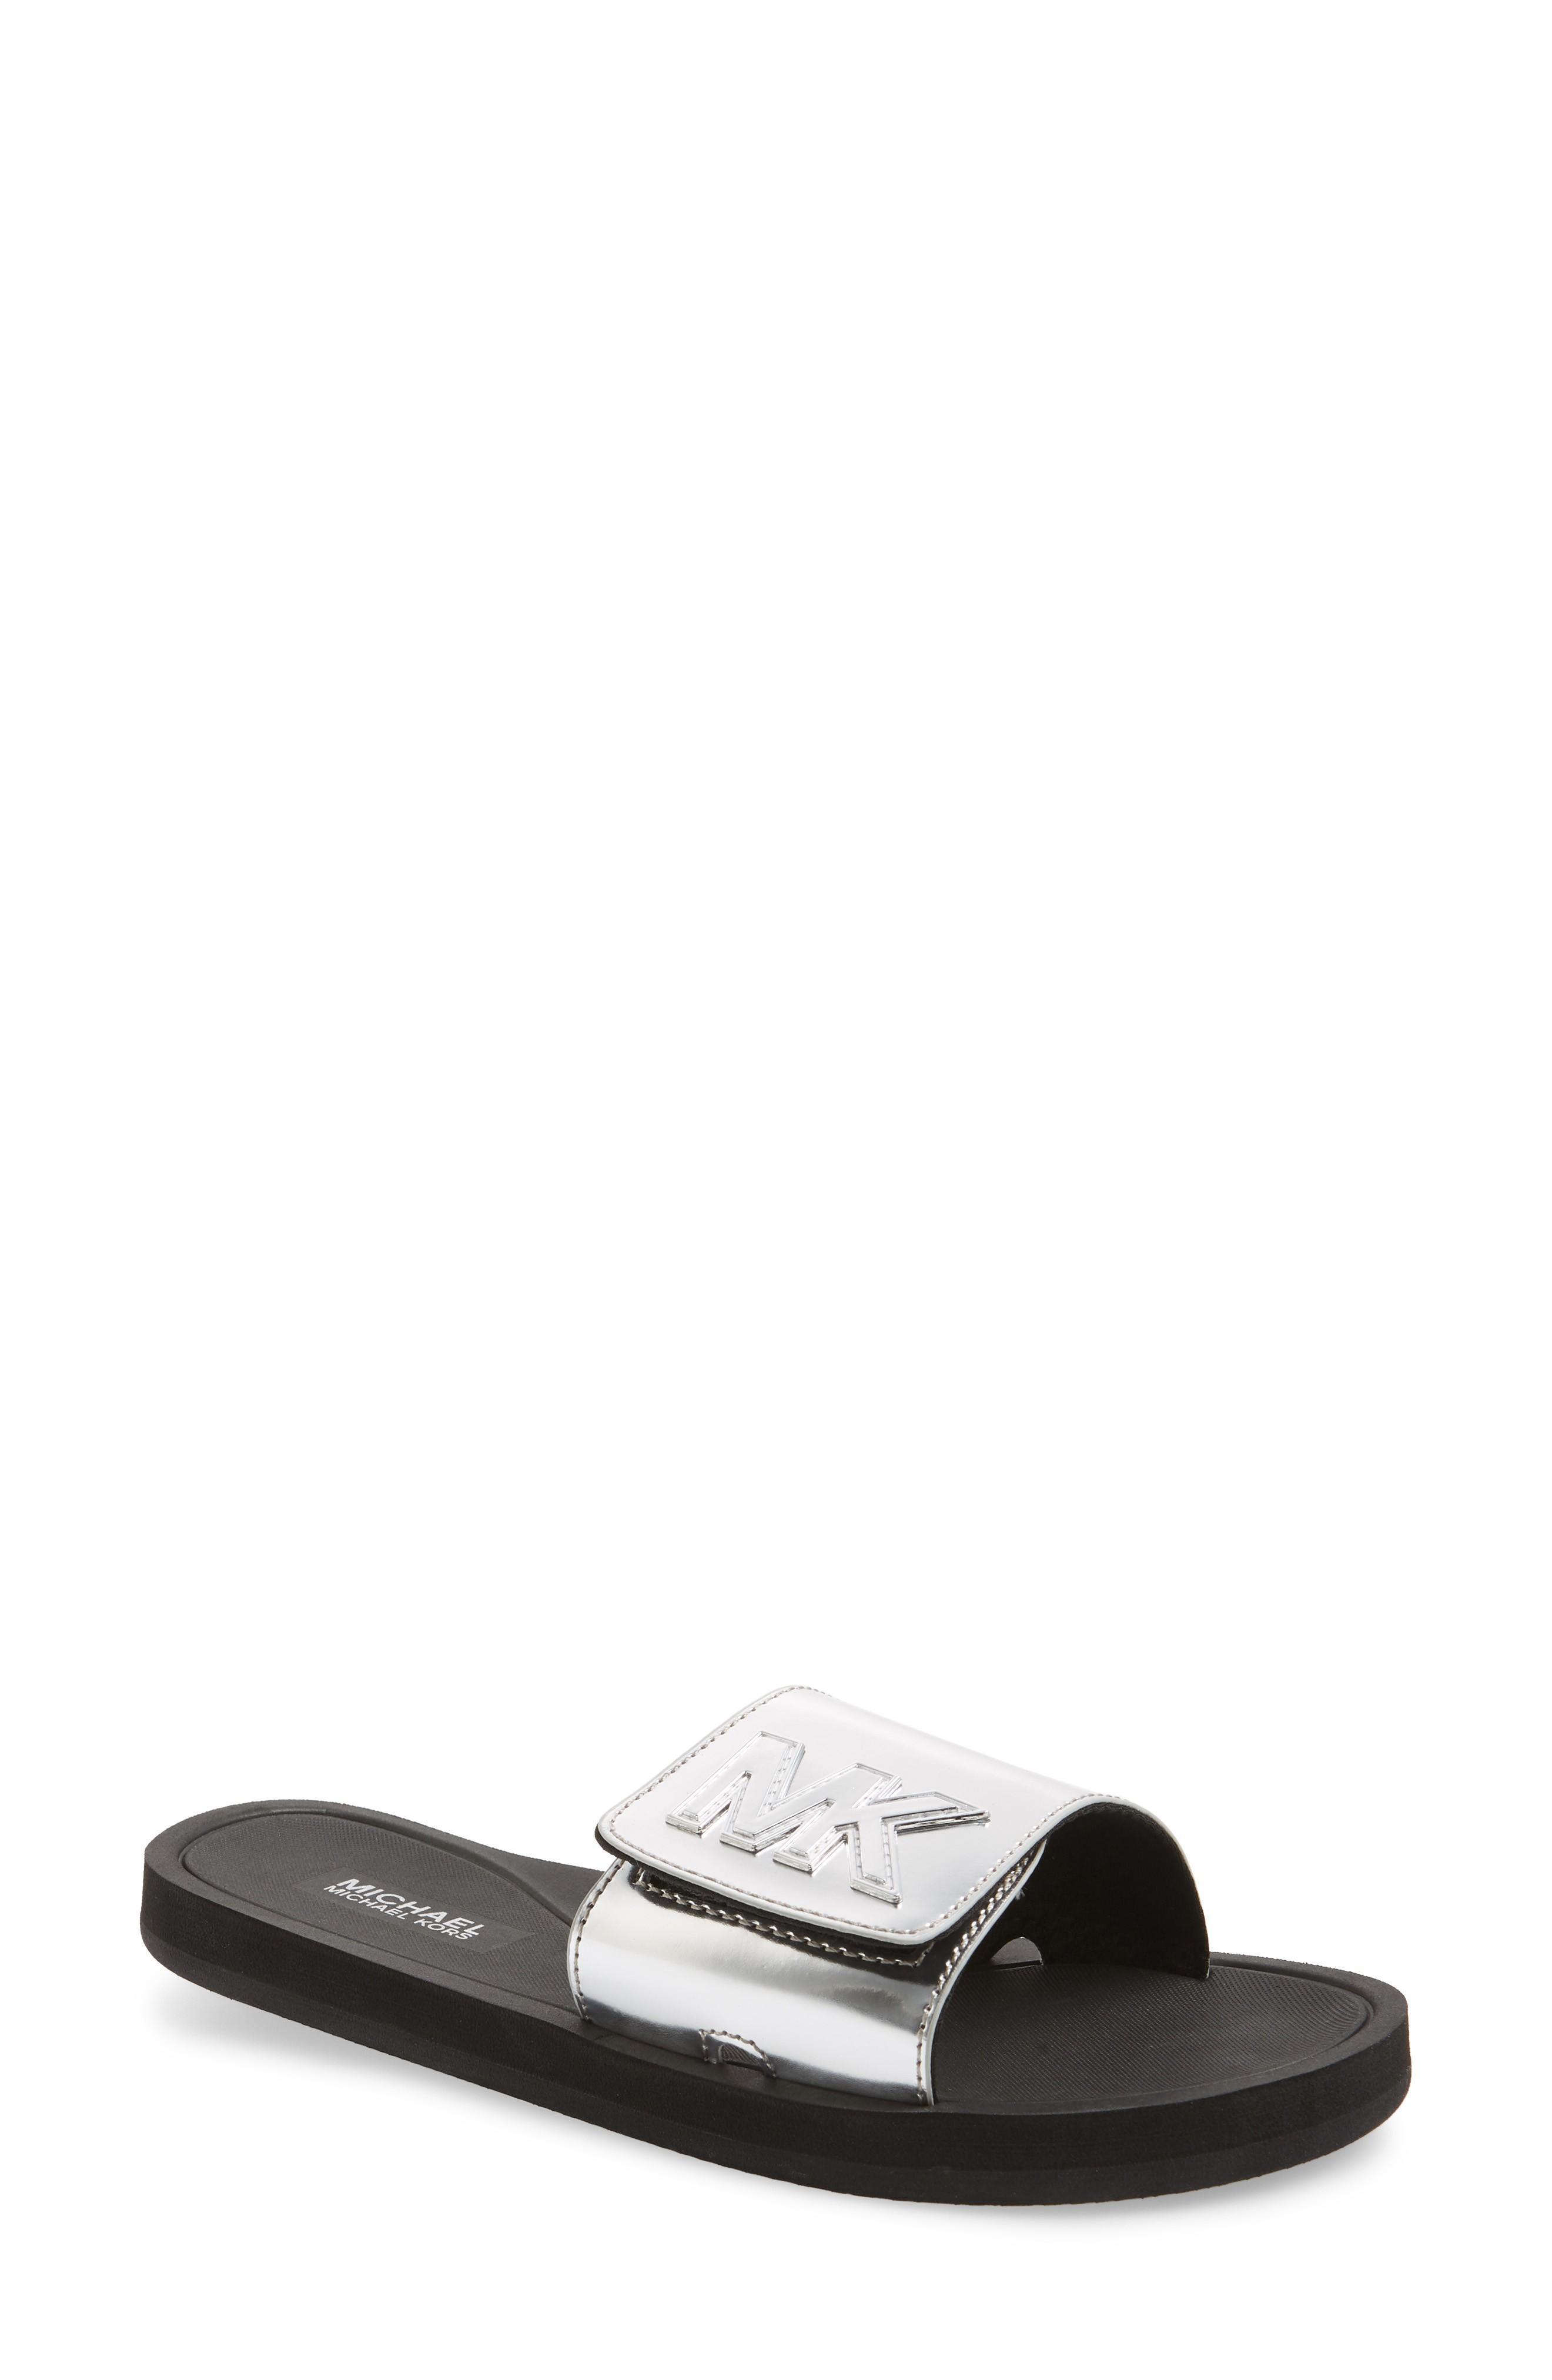 12d86c80cee5 Michael Michael Kors Mk Embellished Fabric Slide Sandal In Multi ...